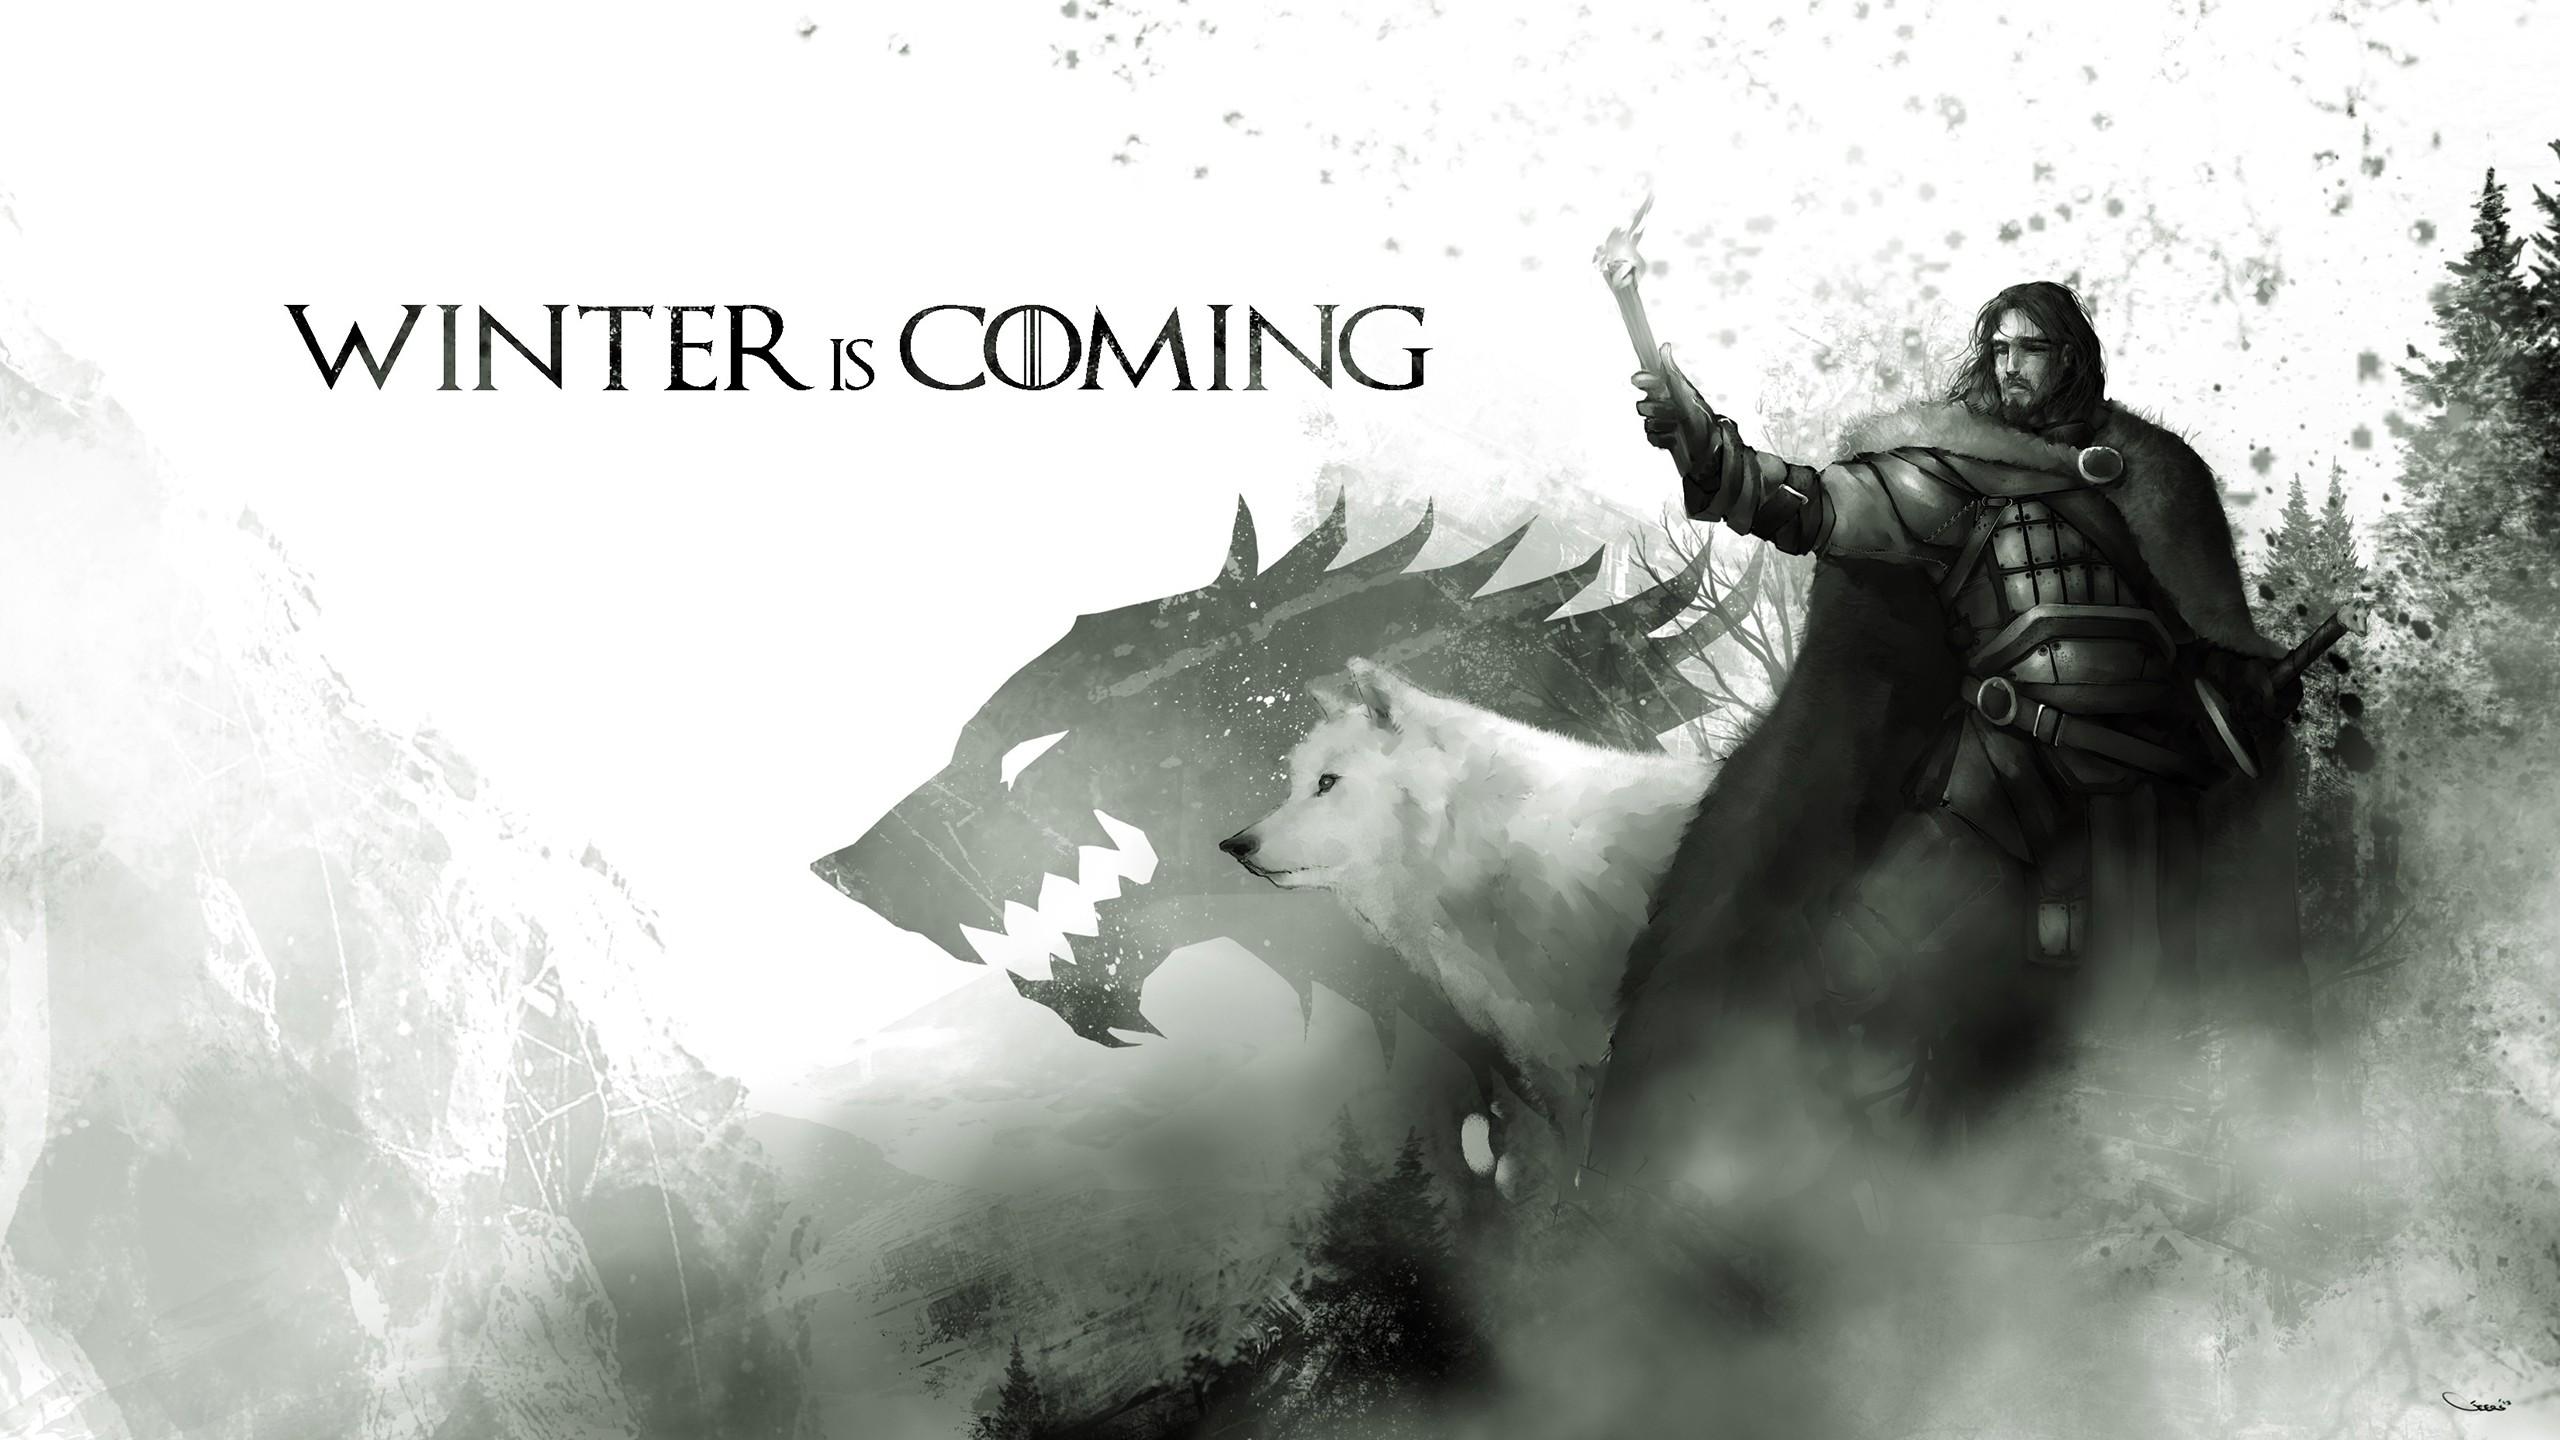 Wallpaper Satu Warna Karya Seni Game Of Thrones Jon Snow 2560x1440 Px Hitam Dan Putih Fotografi Monokrom 2560x1440 Wallup 565924 Hd Wallpapers Wallhere